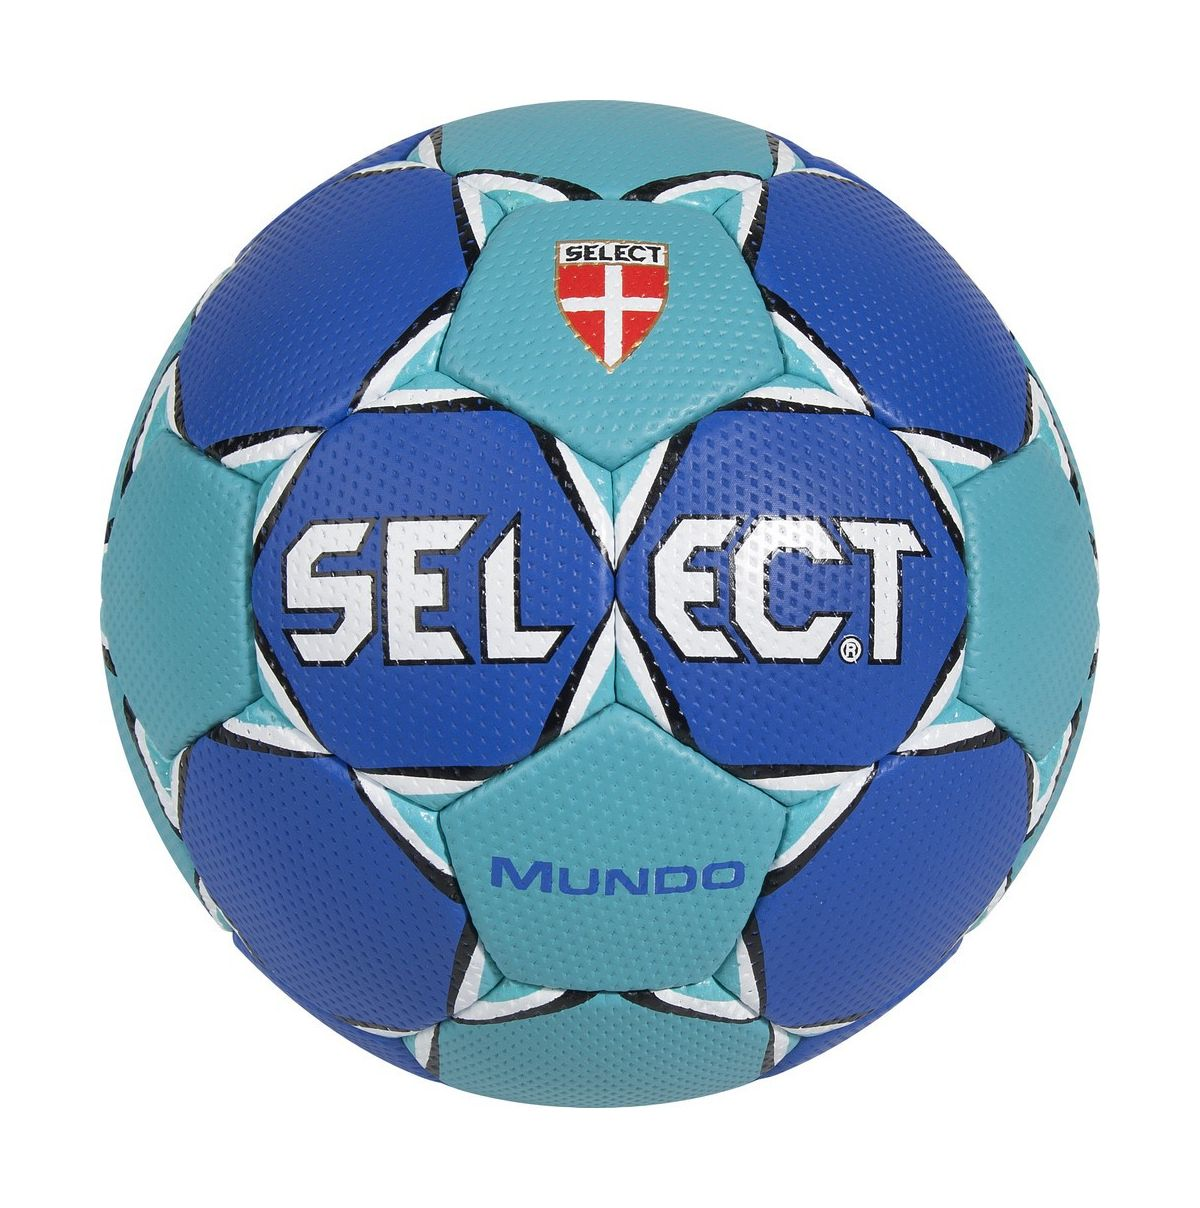 Select mundo blue rukometna lopta sport4pro for Blue select